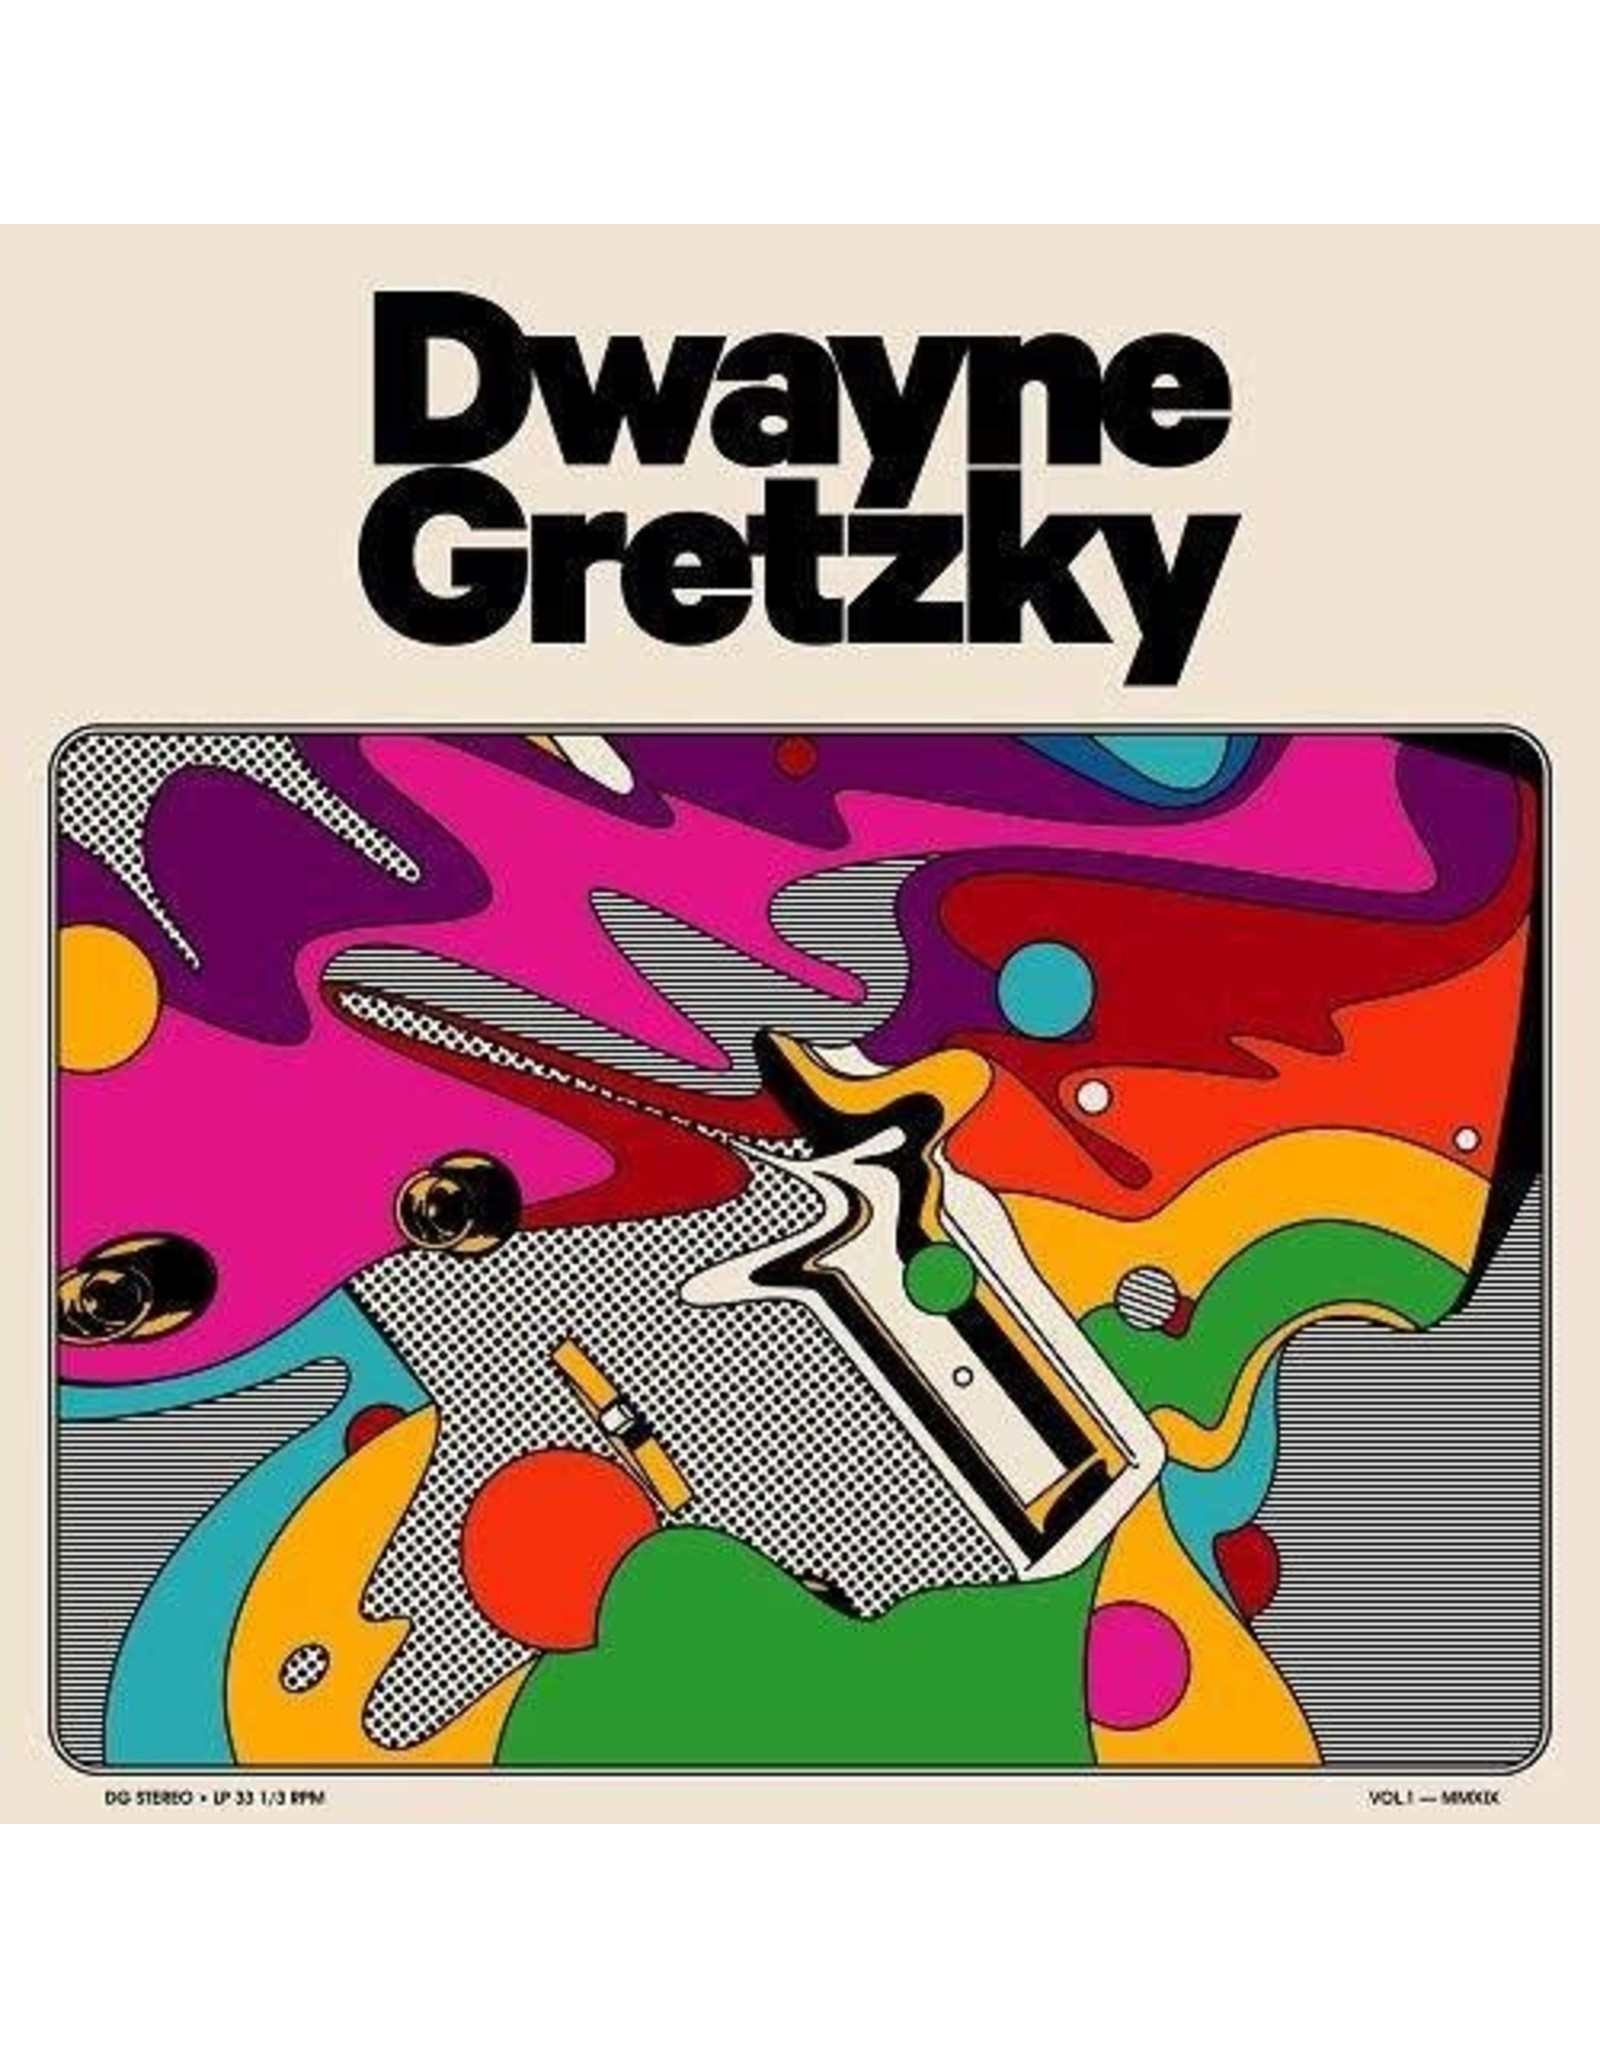 Dwayne Gretzky - Dwayne Gretzky